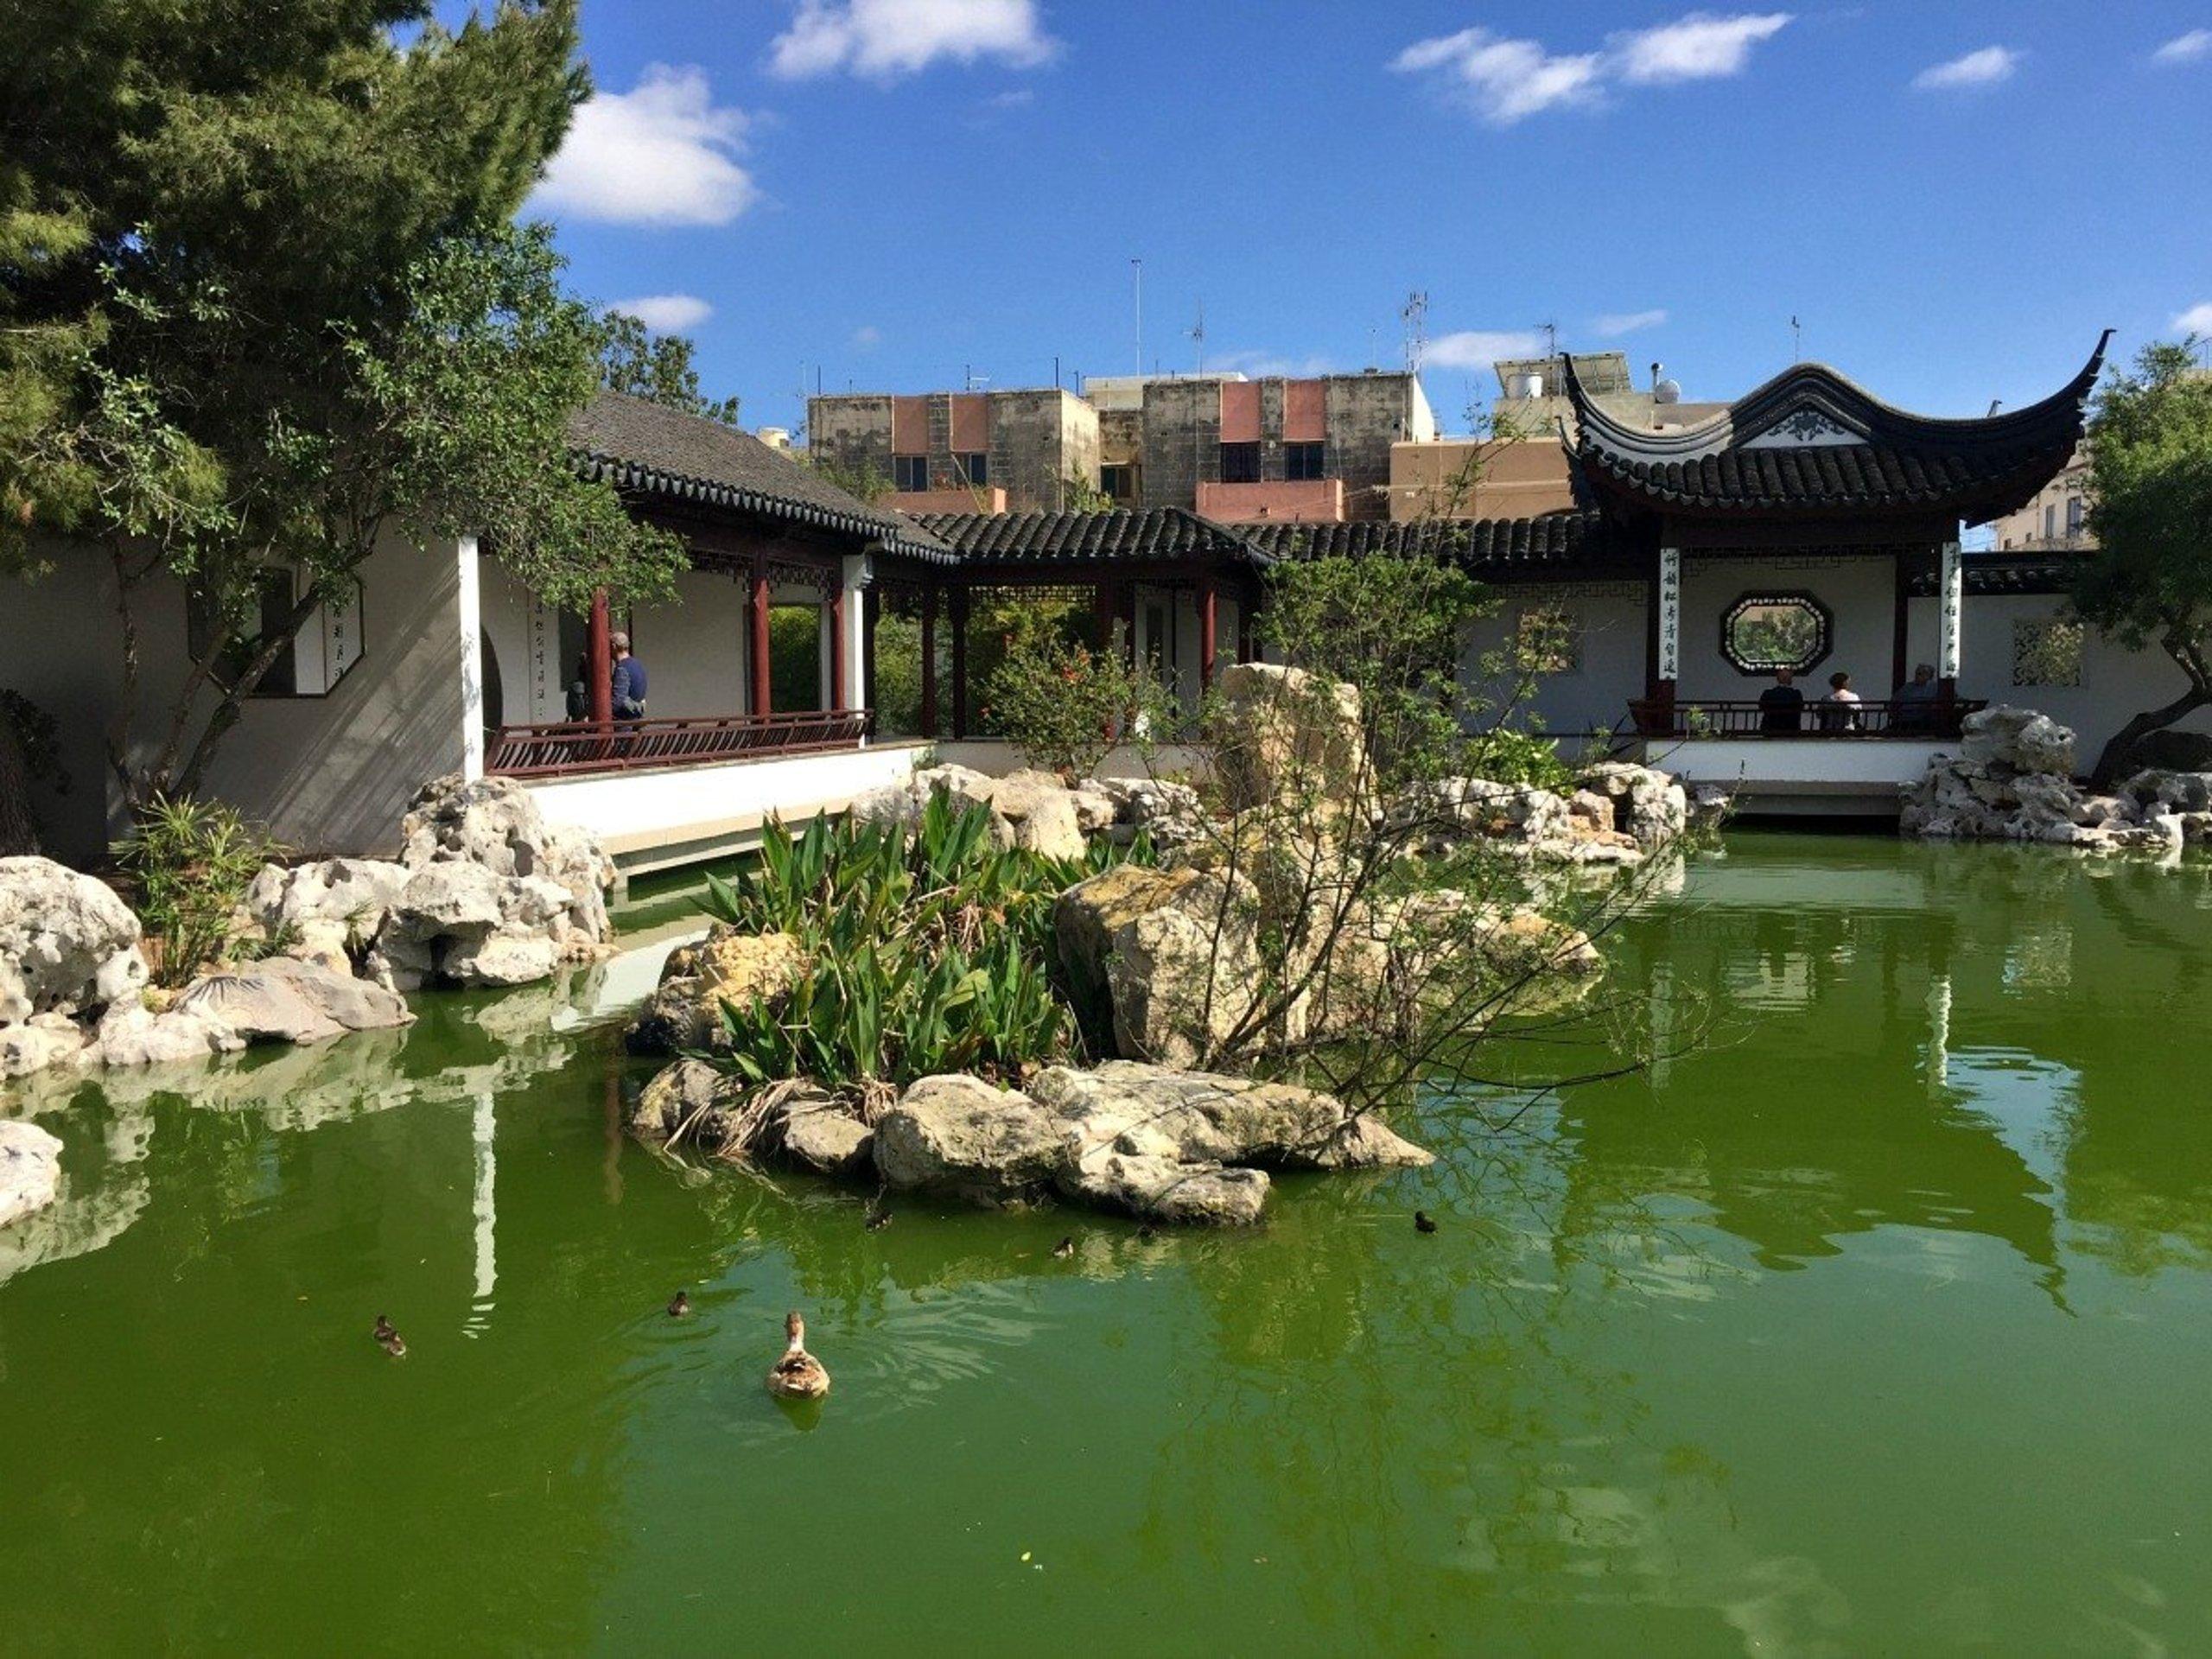 China Garten Luxus Chinese Garden Of Serenity Santa Lucija 2020 All You